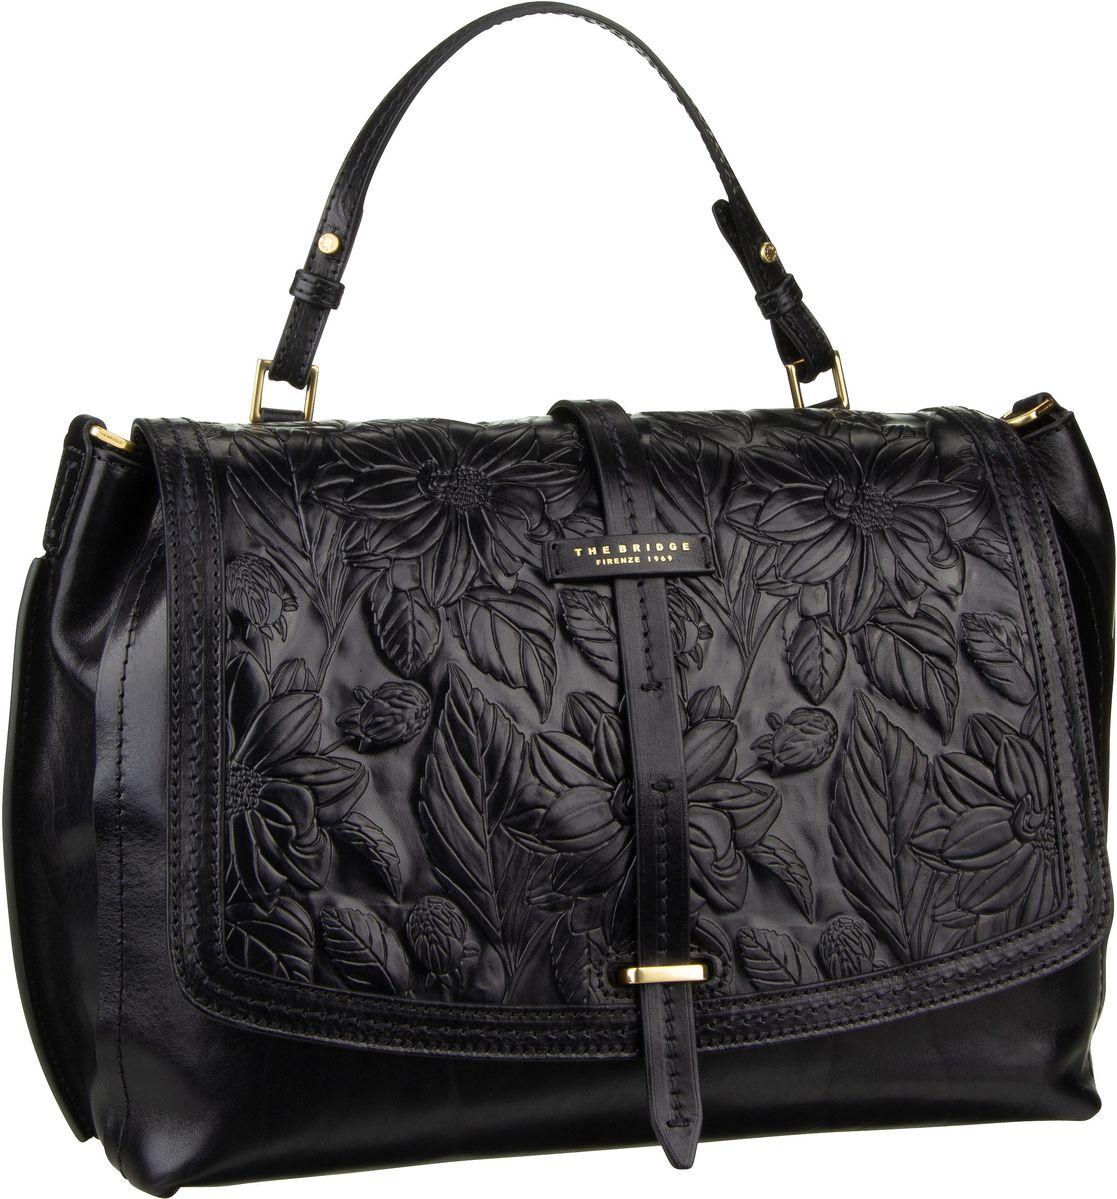 Handtasche Capraia Handtasche 1327 Nero/Oro